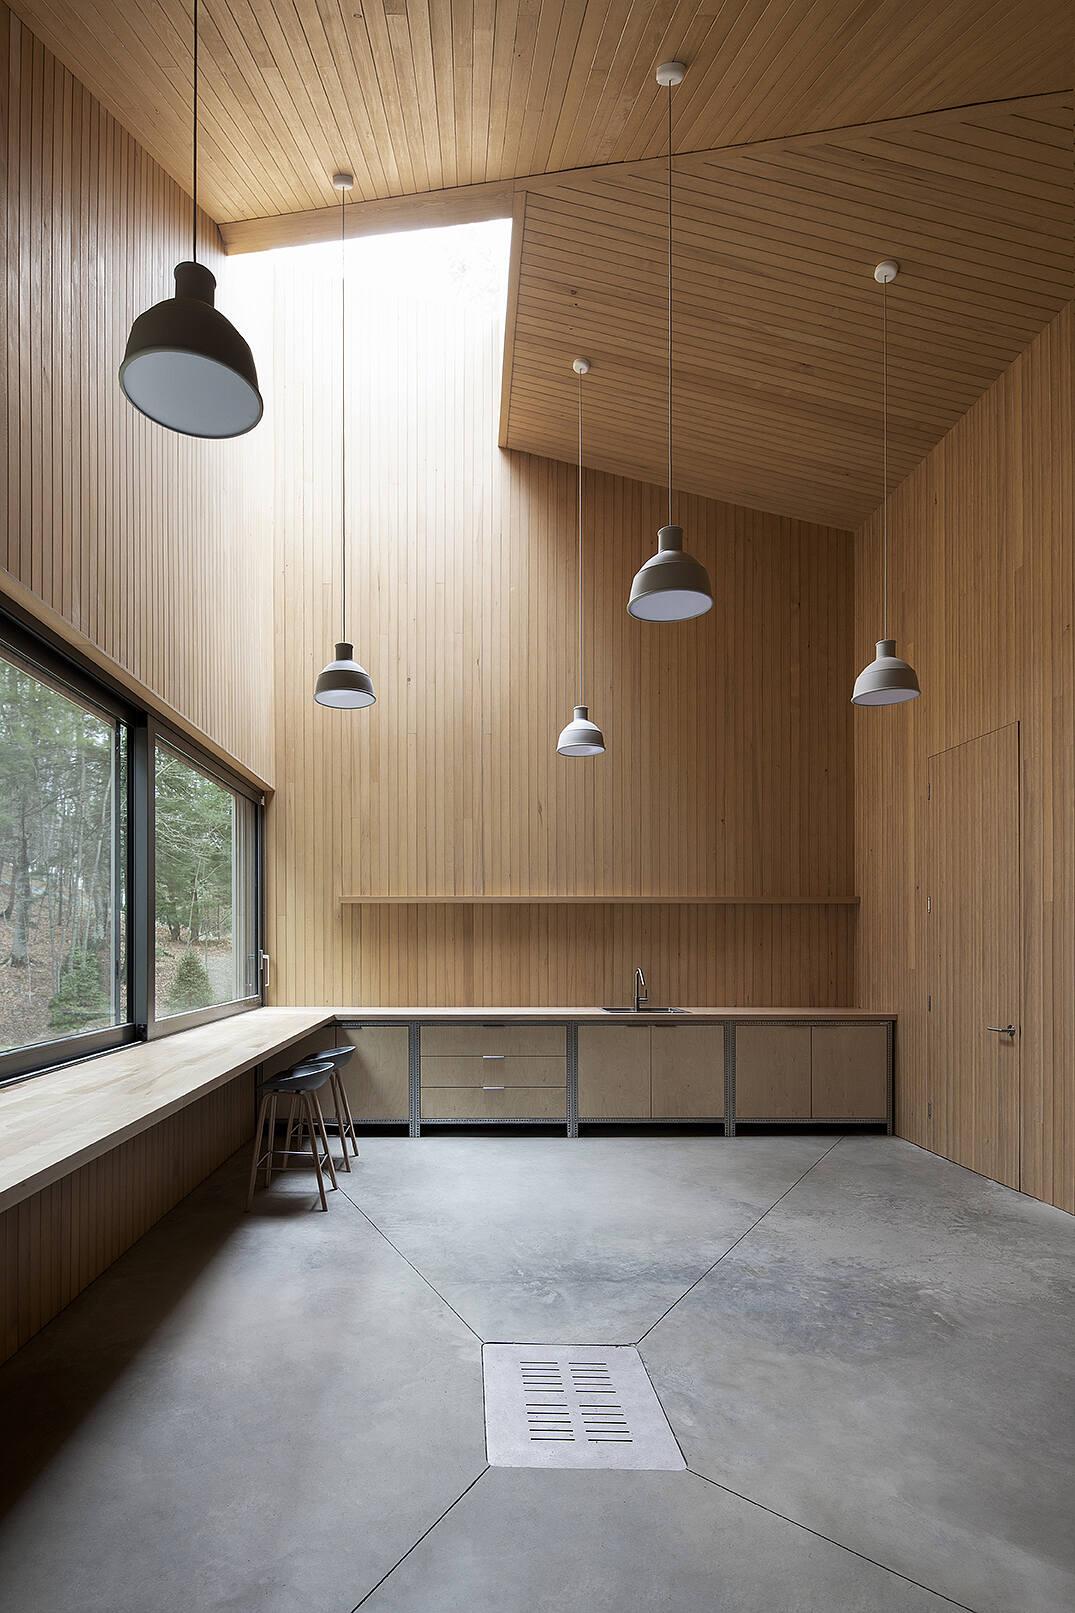 Memphremagog Lake House by Naturehumaine [architecture+design]